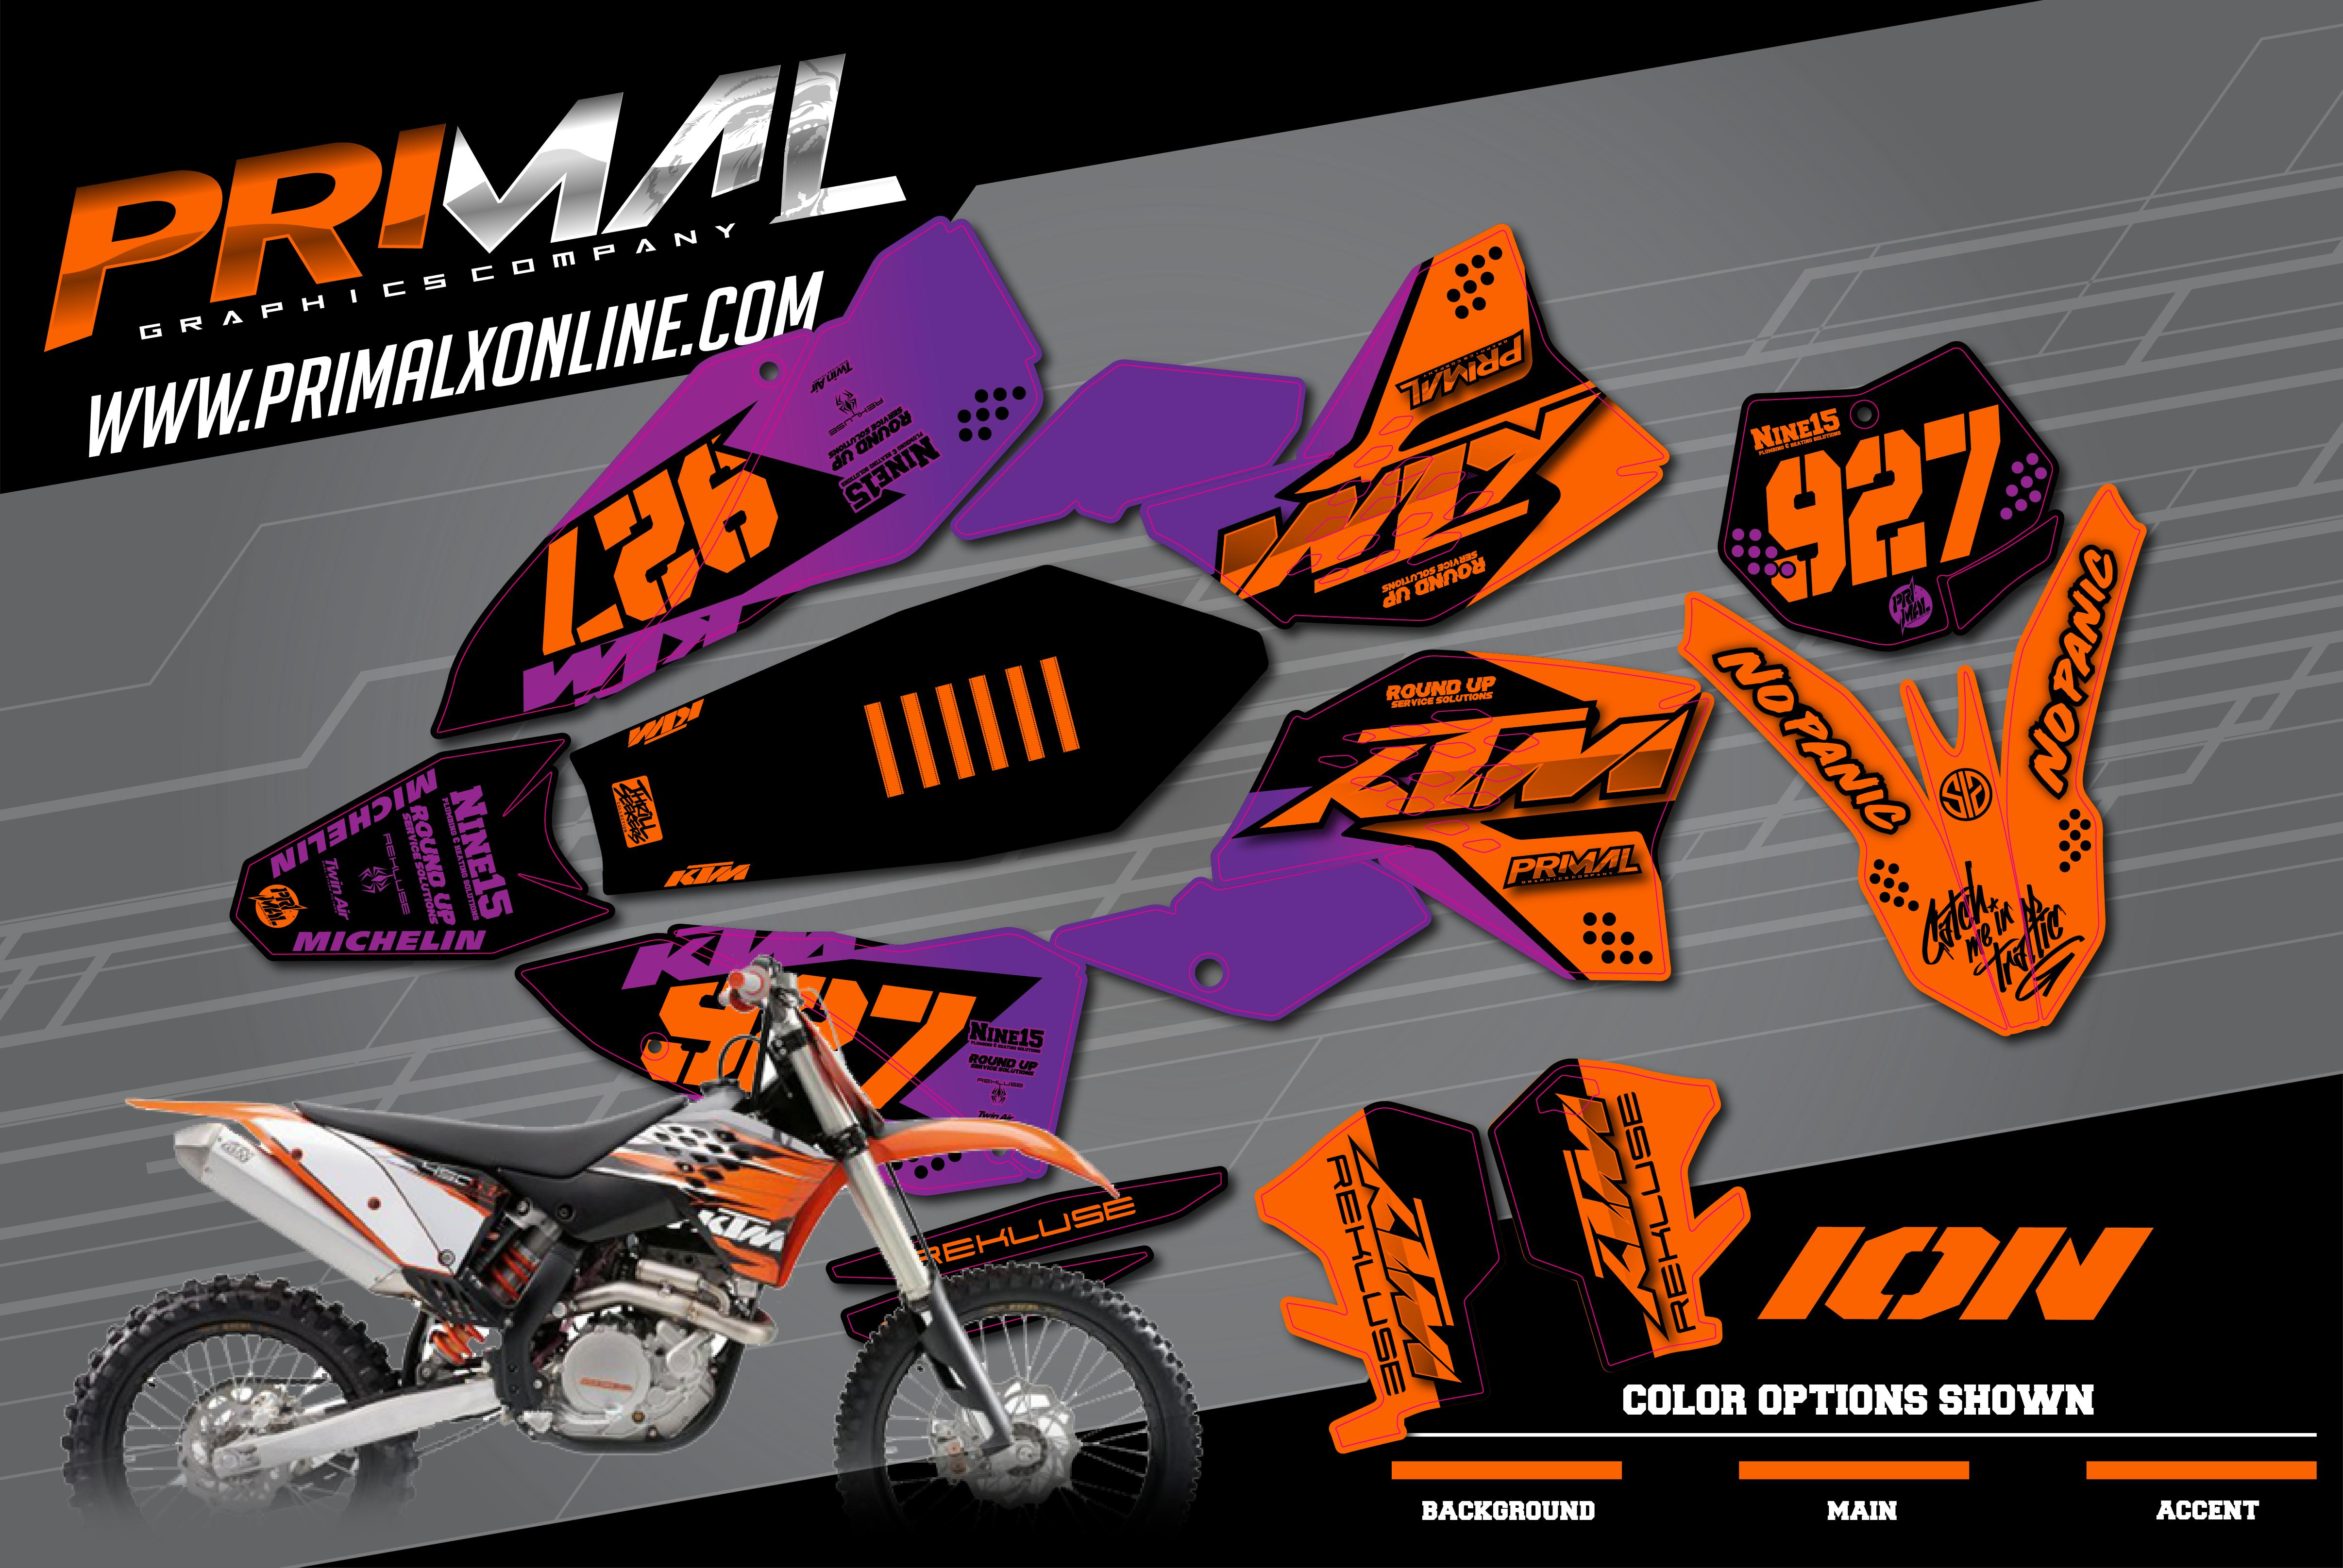 PRIMAL-X-MOTORSPORTS-PRIMAL-GRAPHICS-CO-KTM-ION-SERIES-01